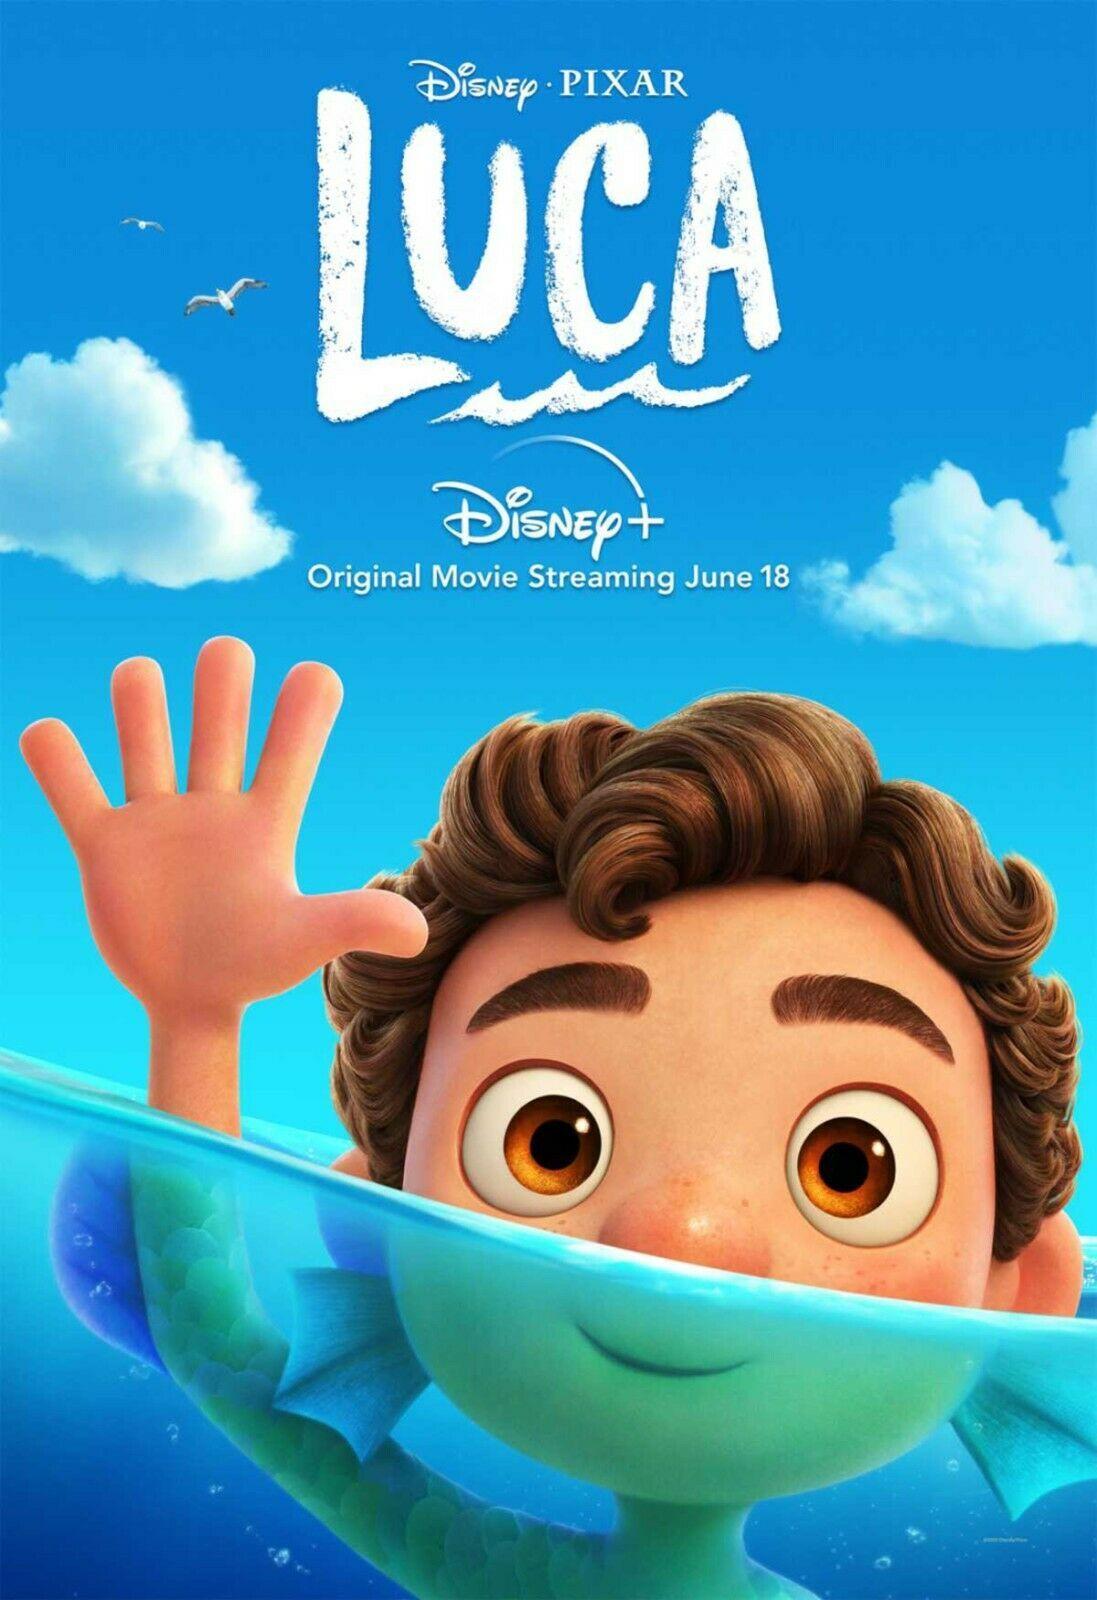 Luca (2021) película de animación de Seda cartel de alta calidad de pared decoración de hogar (e) 24x36in